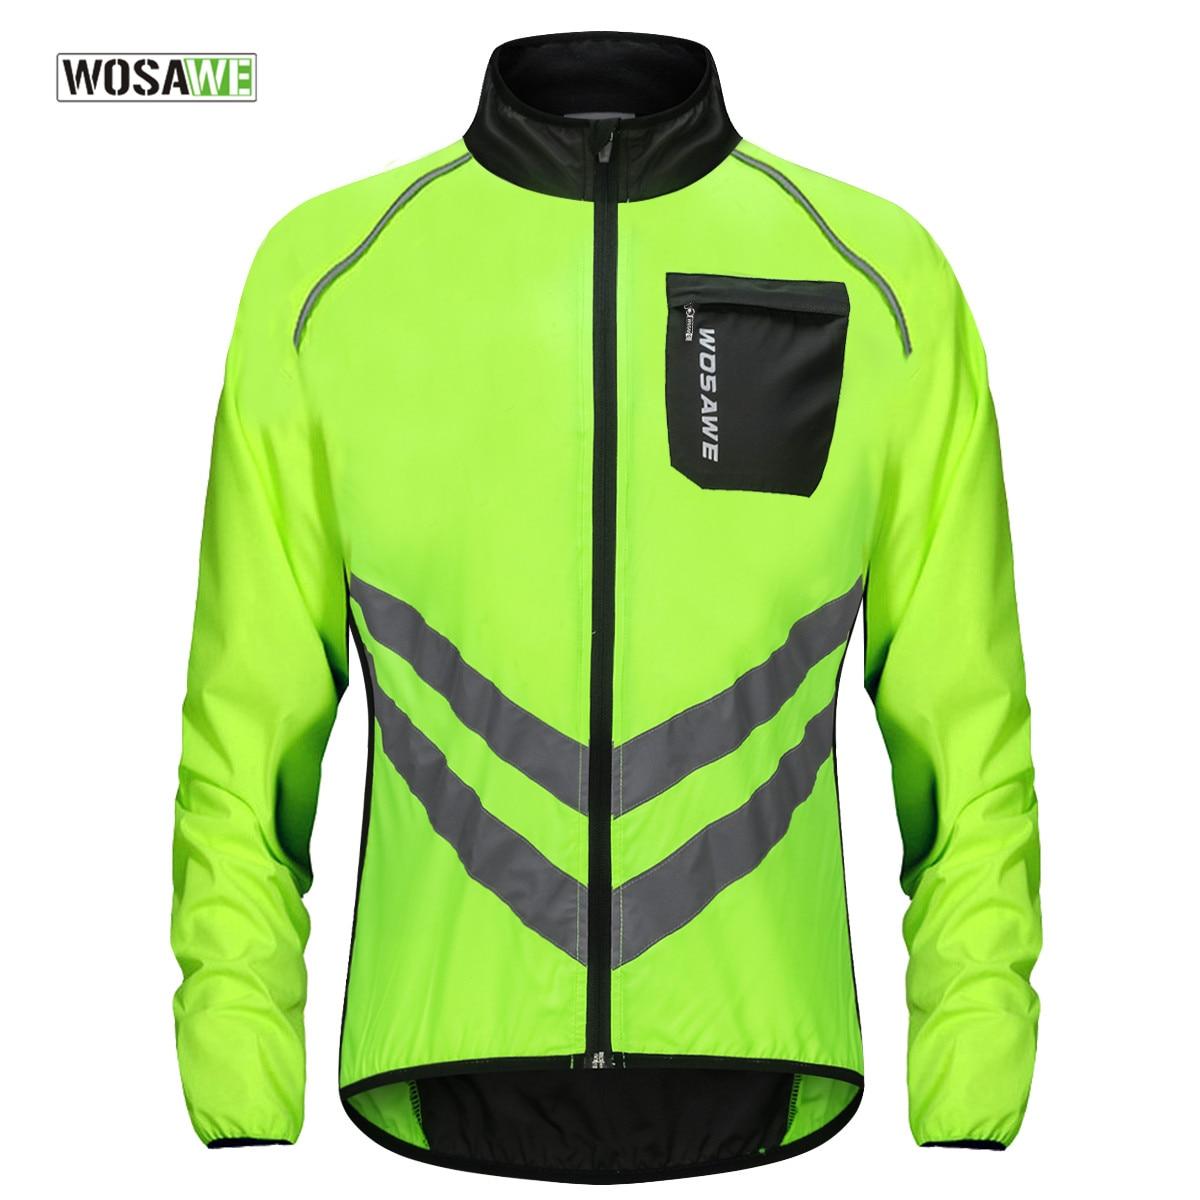 aliexpress.com - WOSAWE Cycling Rain Jacket High Visibility MultiFunction Jersey Road MTB Bike Bicycle Windproof Quick Dry Rain Coat Windbreaker